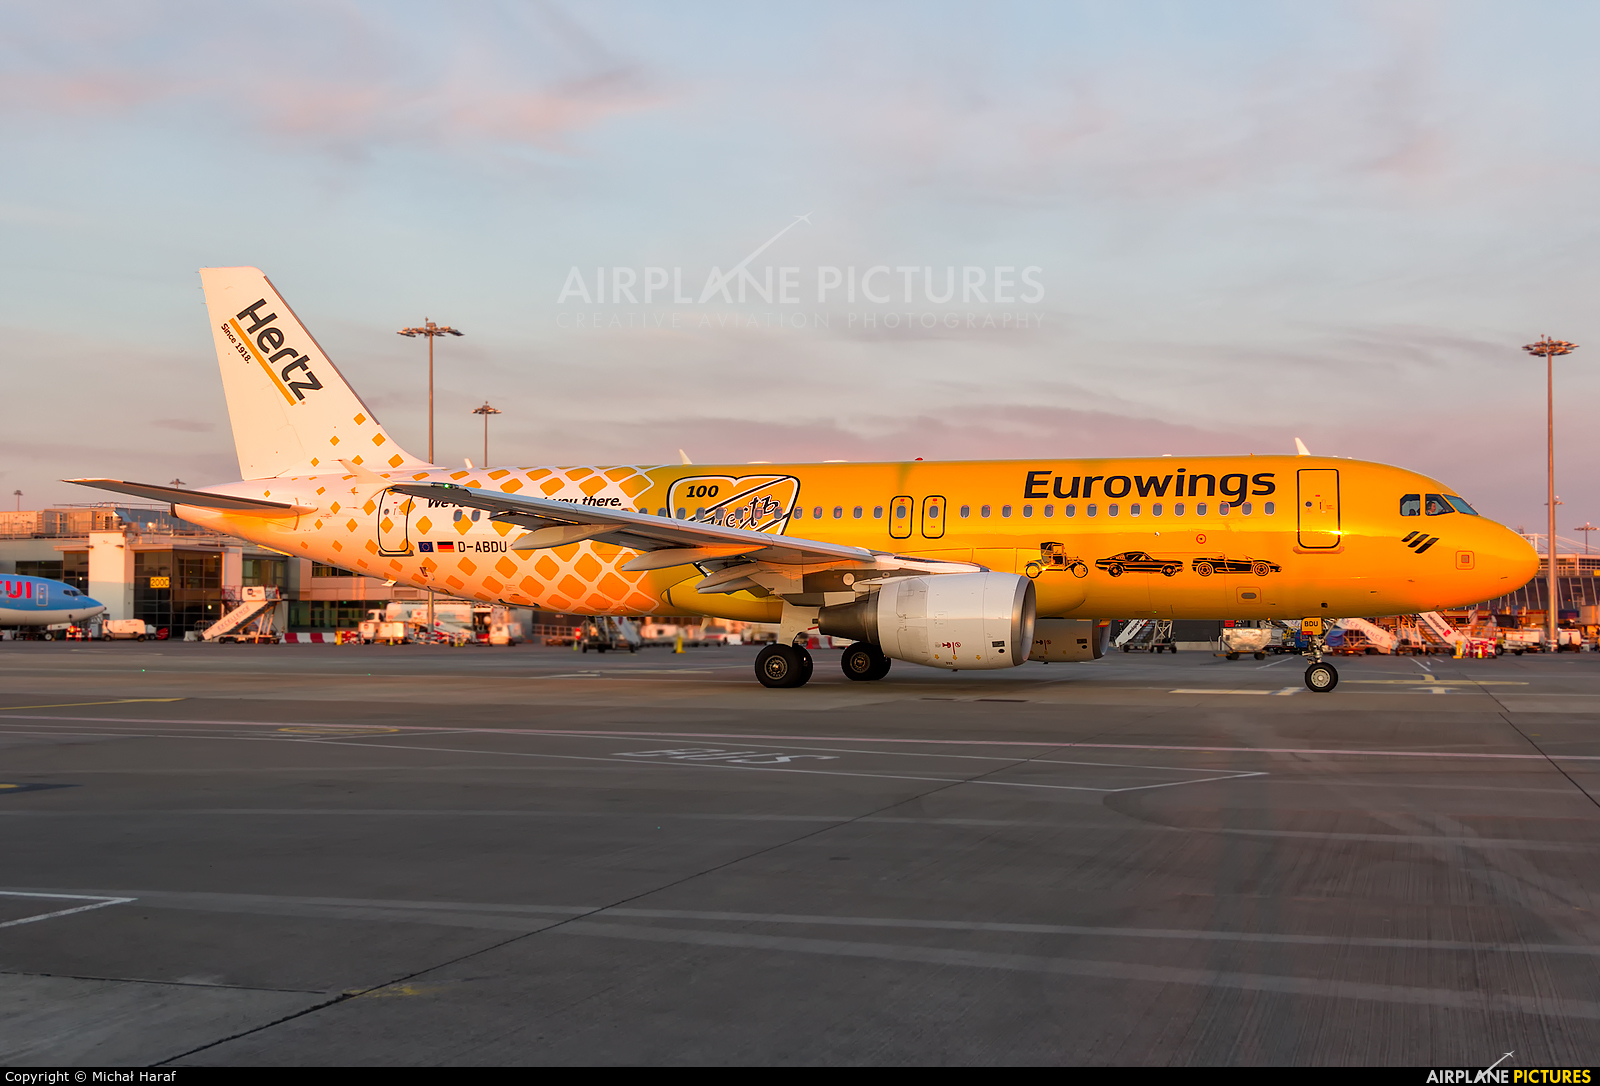 Eurowings D-ABDU aircraft at Dublin